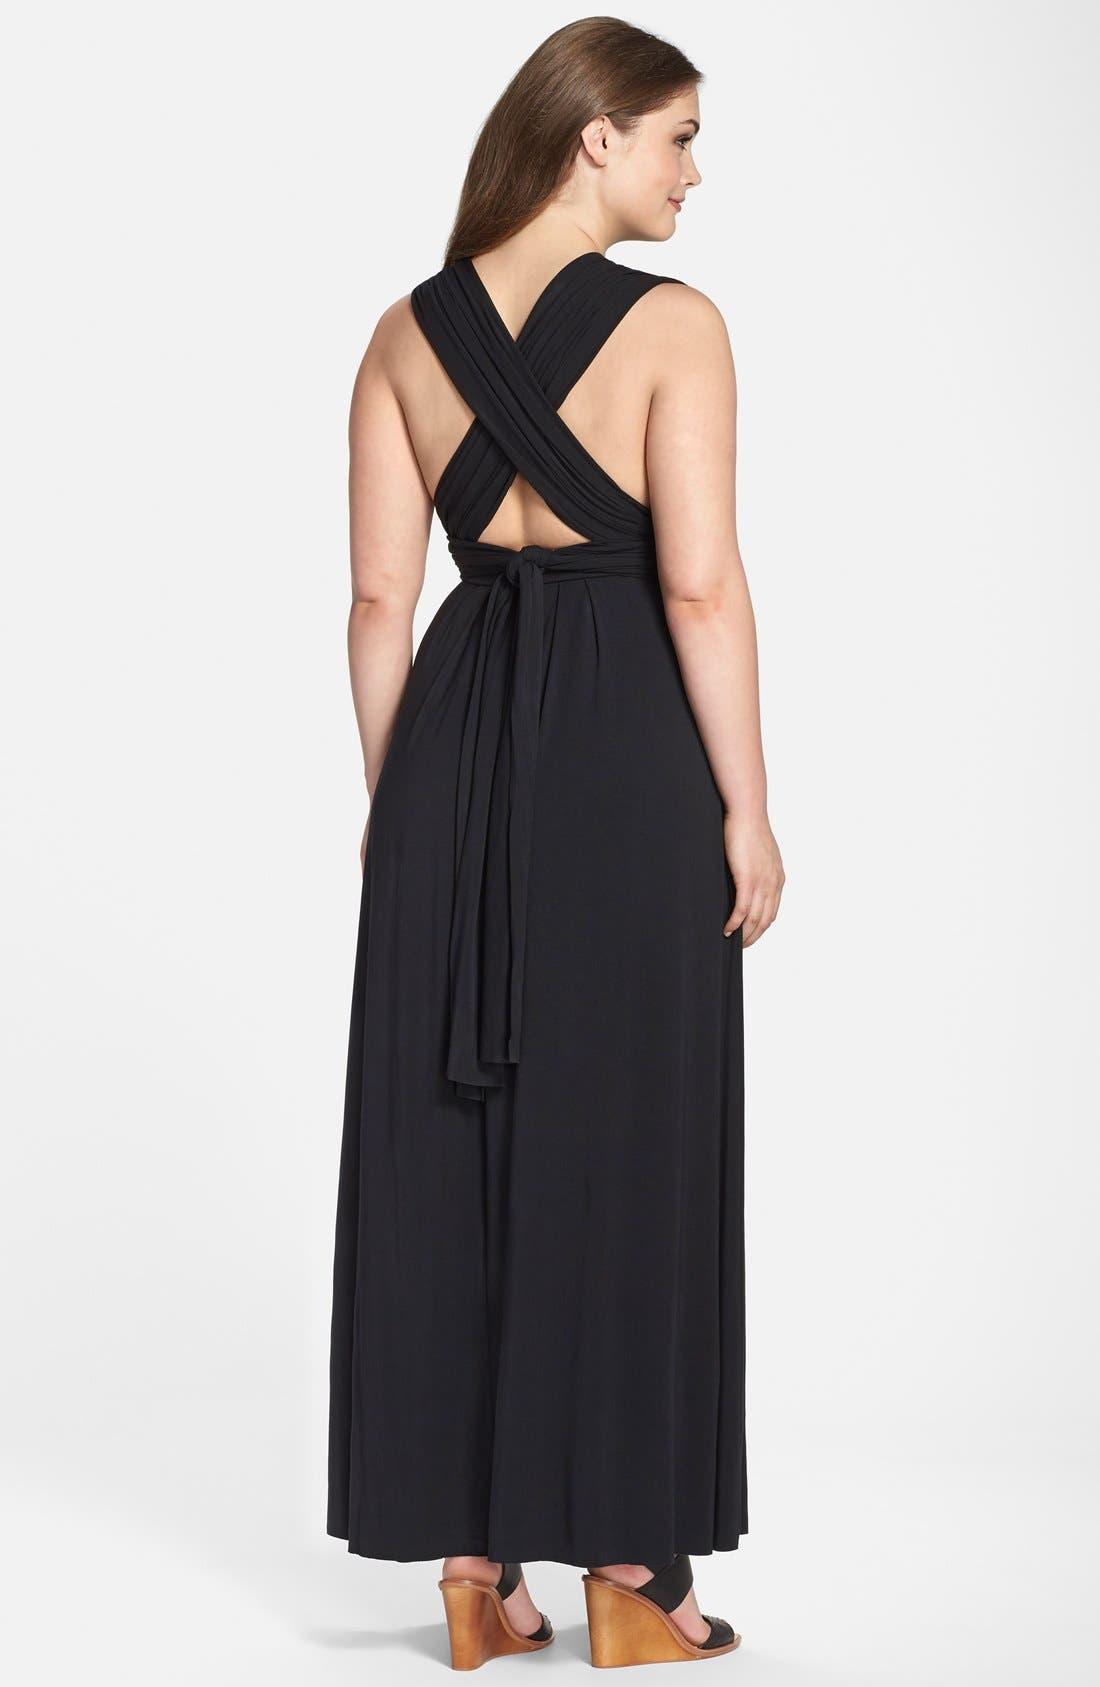 8a26d2008bf Women s Black Dresses